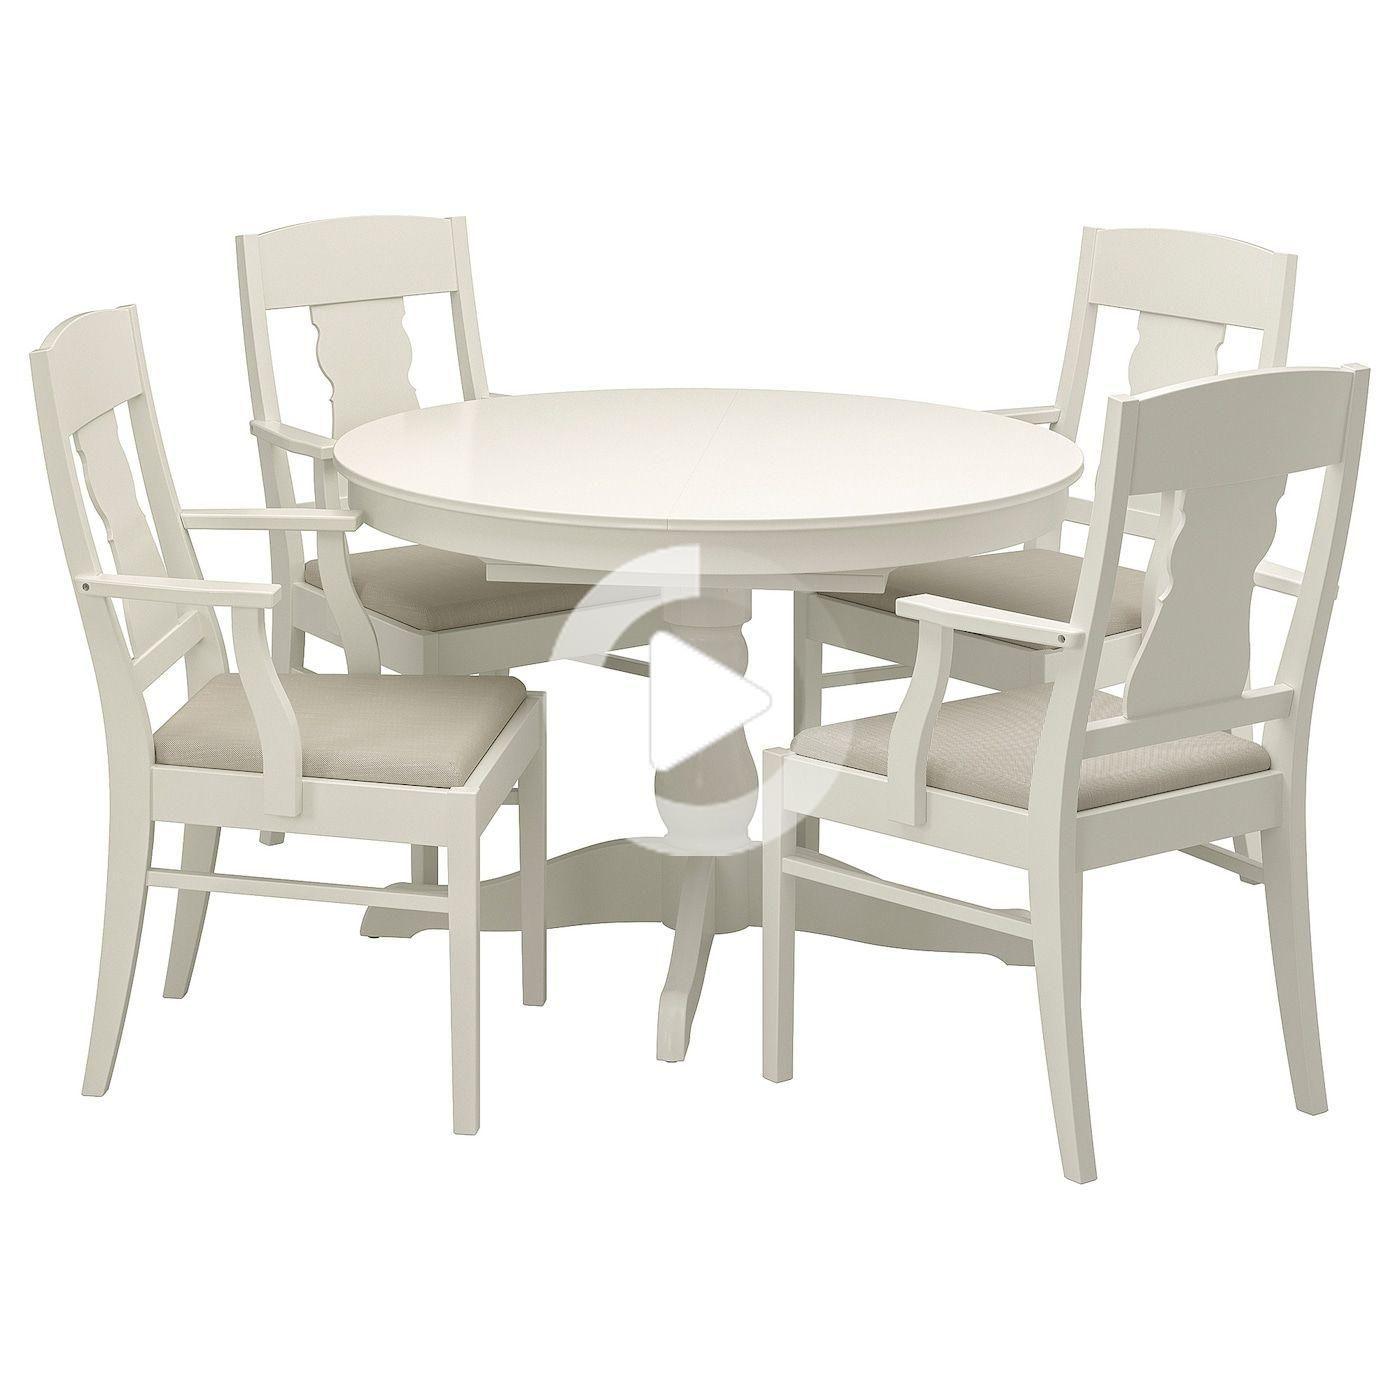 Ikea Ingatorp Table Et 4 Chaises En 2020 Ensemble Table Et Chaise Table A Rallonge Ikea